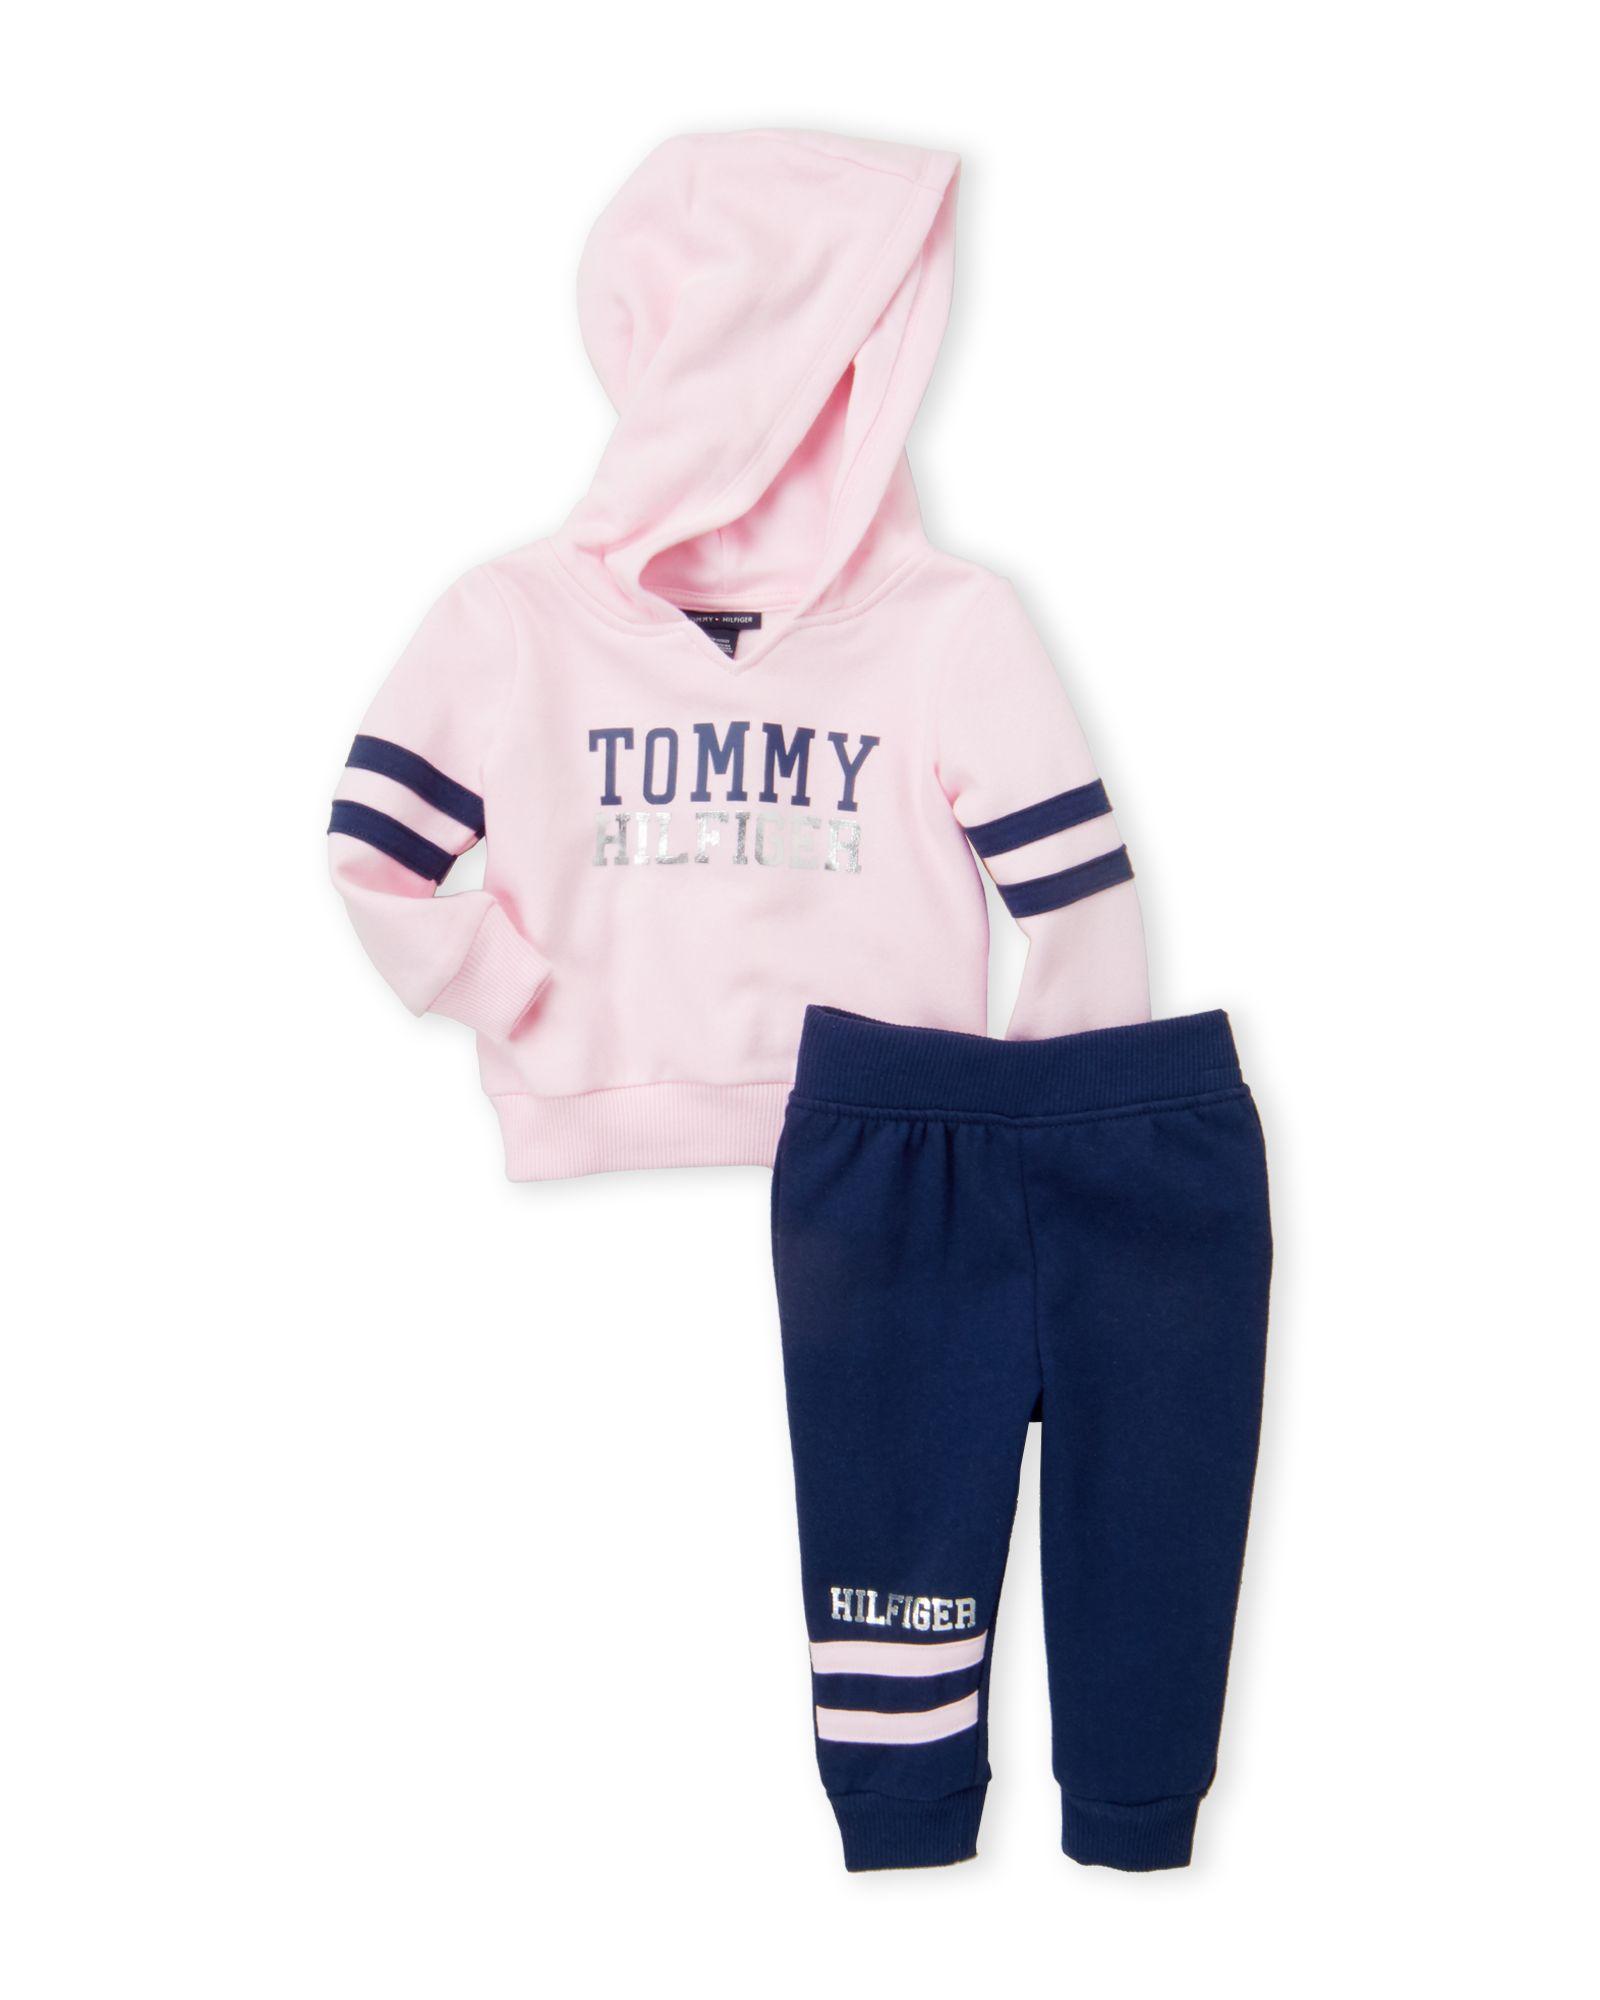 Tommy Hilfiger Sudadera para Beb/és